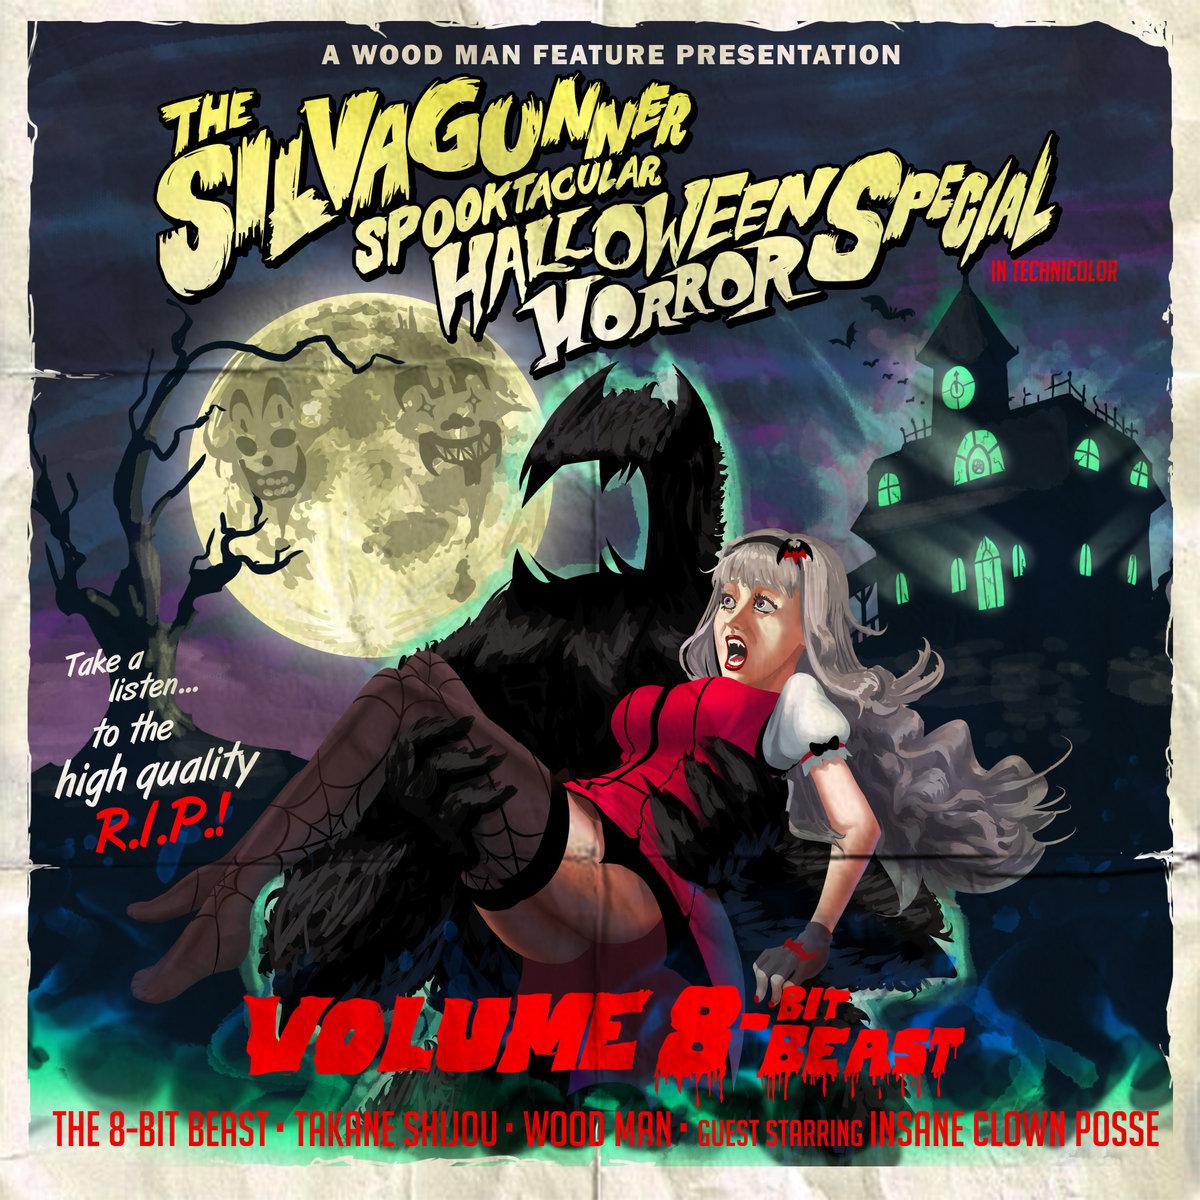 the silvagunner spooktacular halloween horror special: volume 8-bit